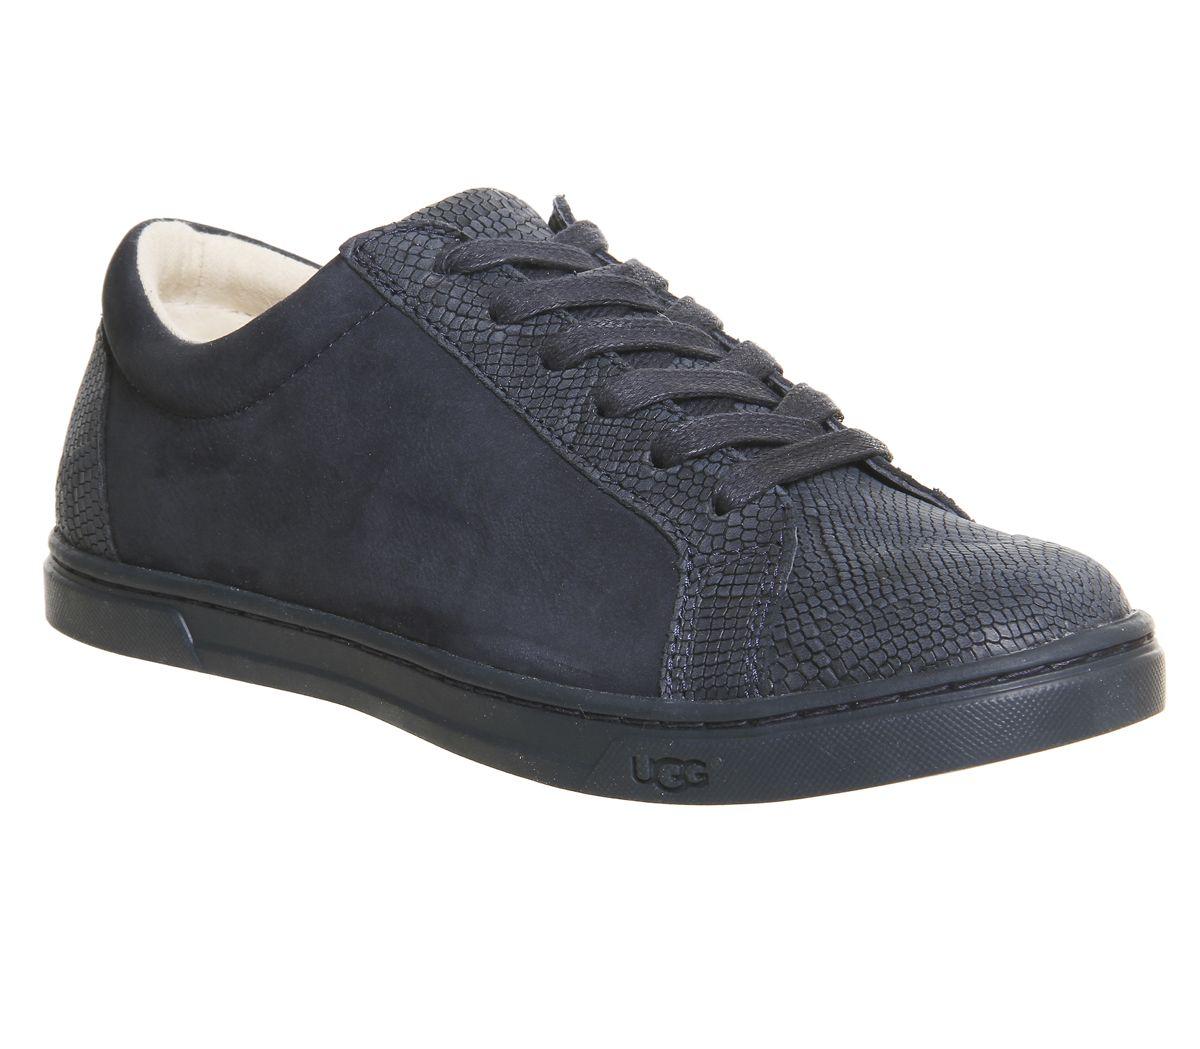 74cc0eb4585 Karine Sneakers